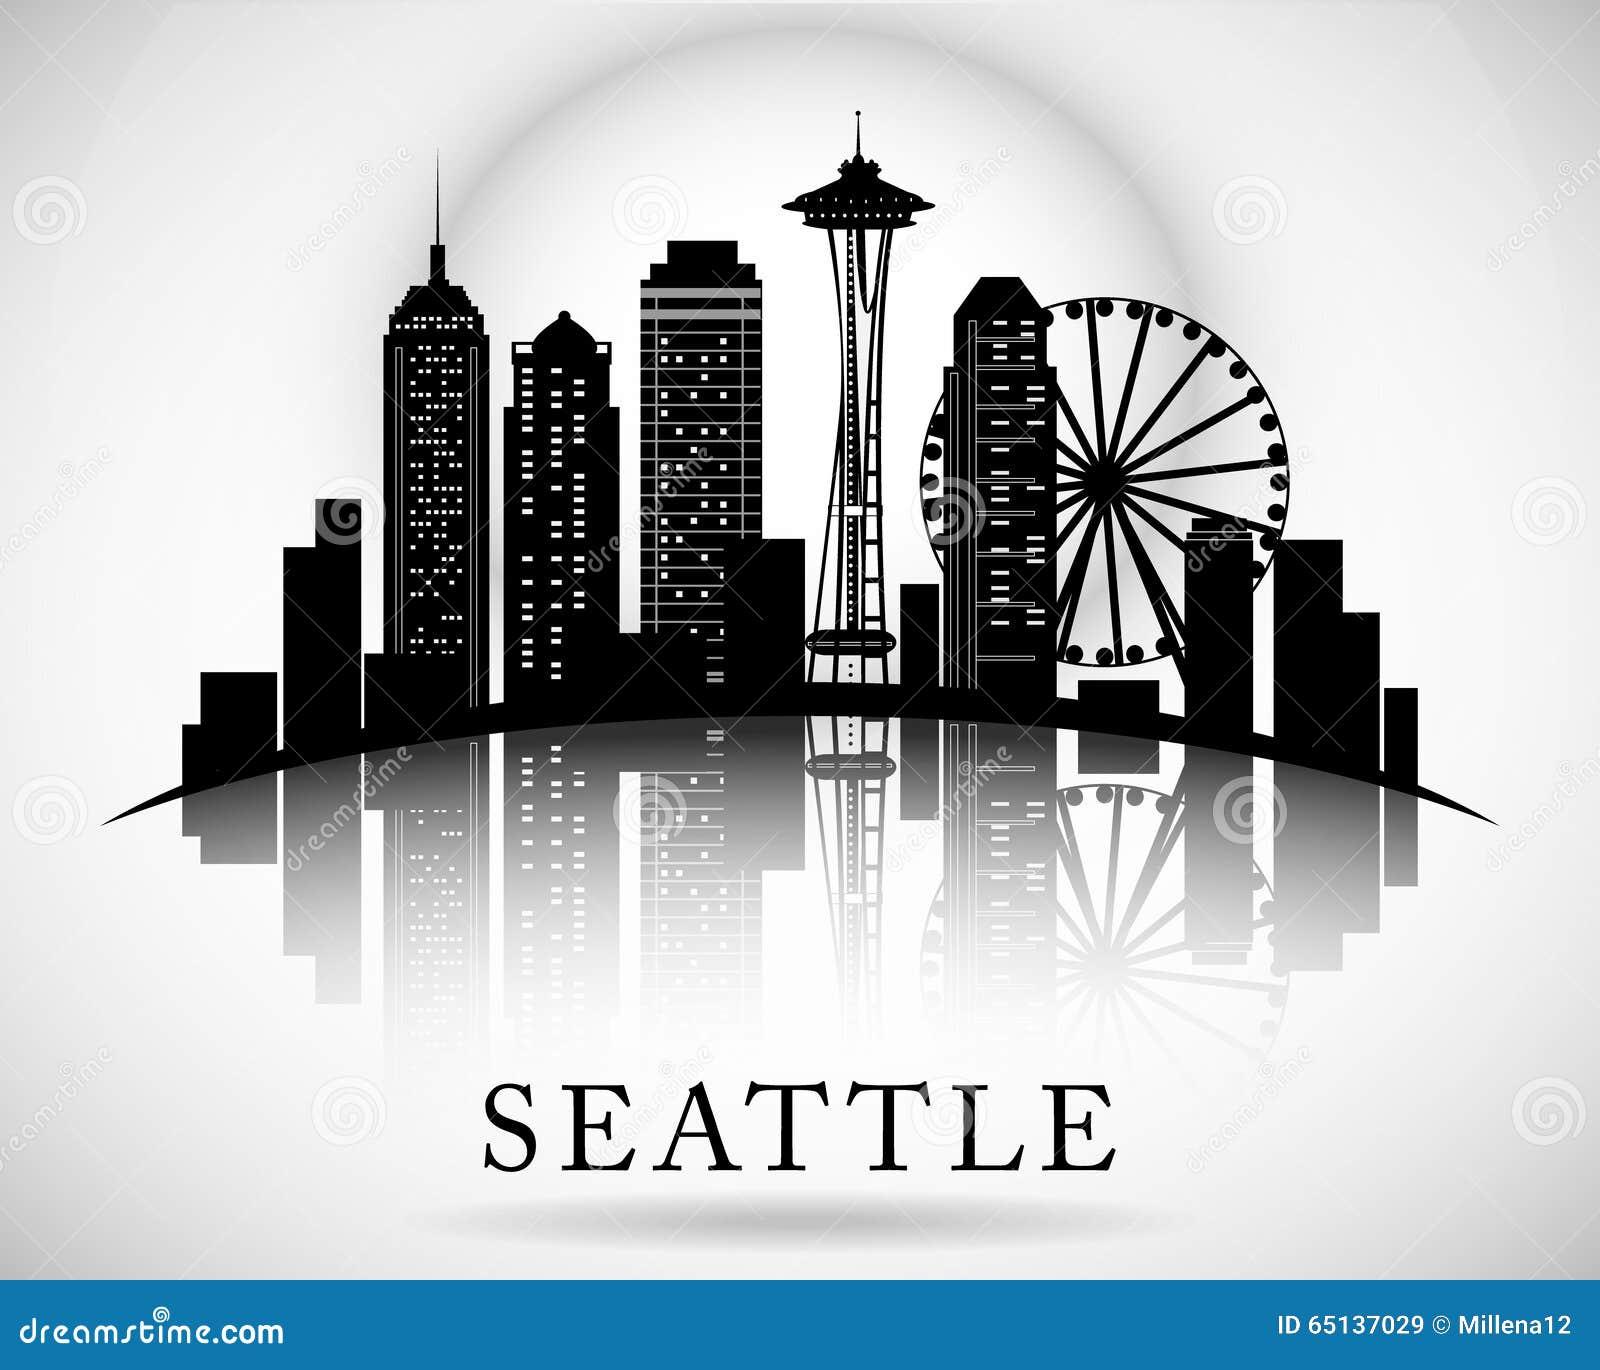 seattle city skyline vector city silhouette stock vector Seattle Skyline Outline Seattle Skyline Stencil